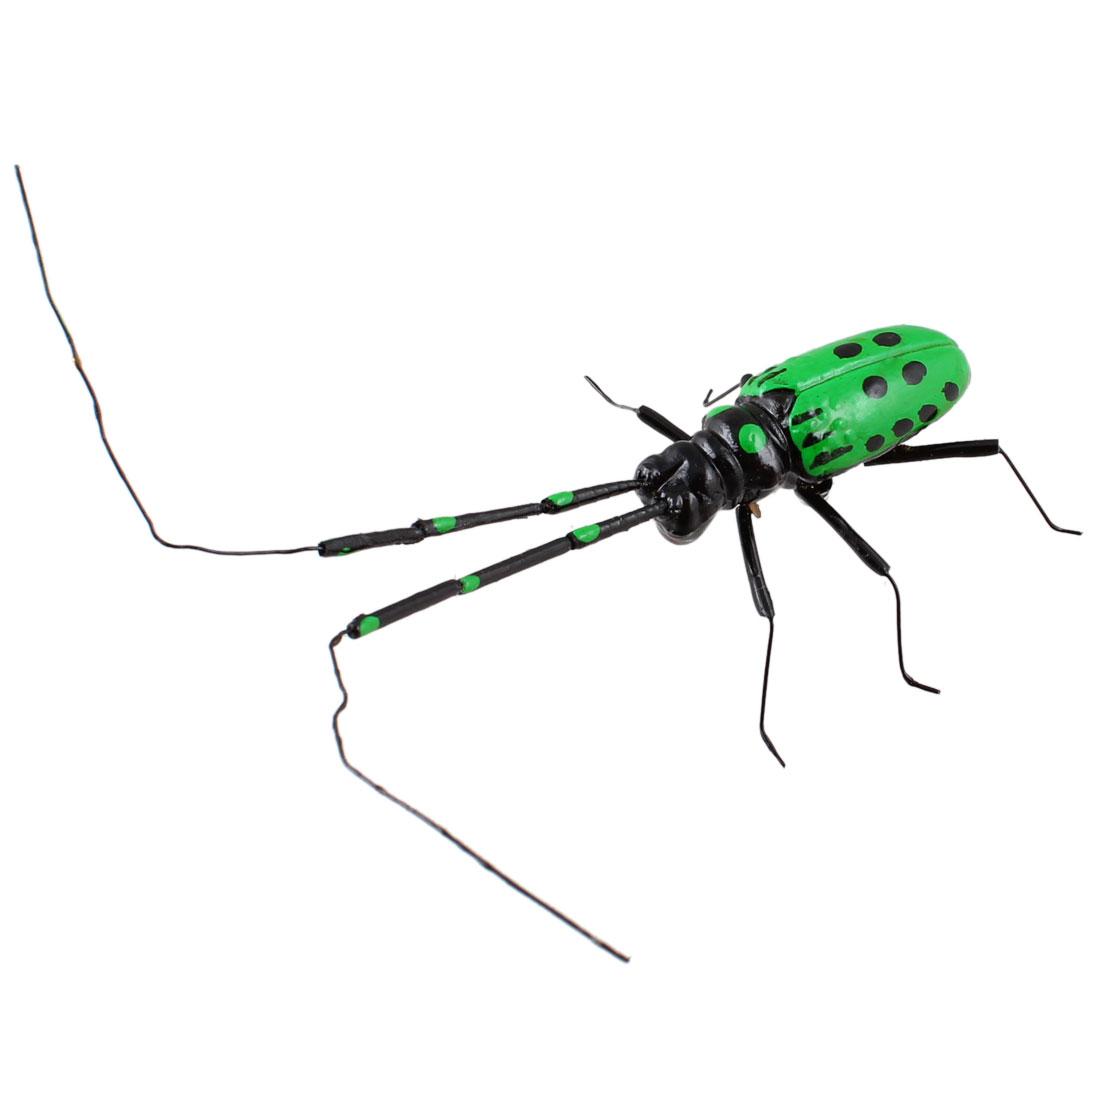 Refrigerator Fridge Decor Green Plastic Cicada Design Magnetic Sticker